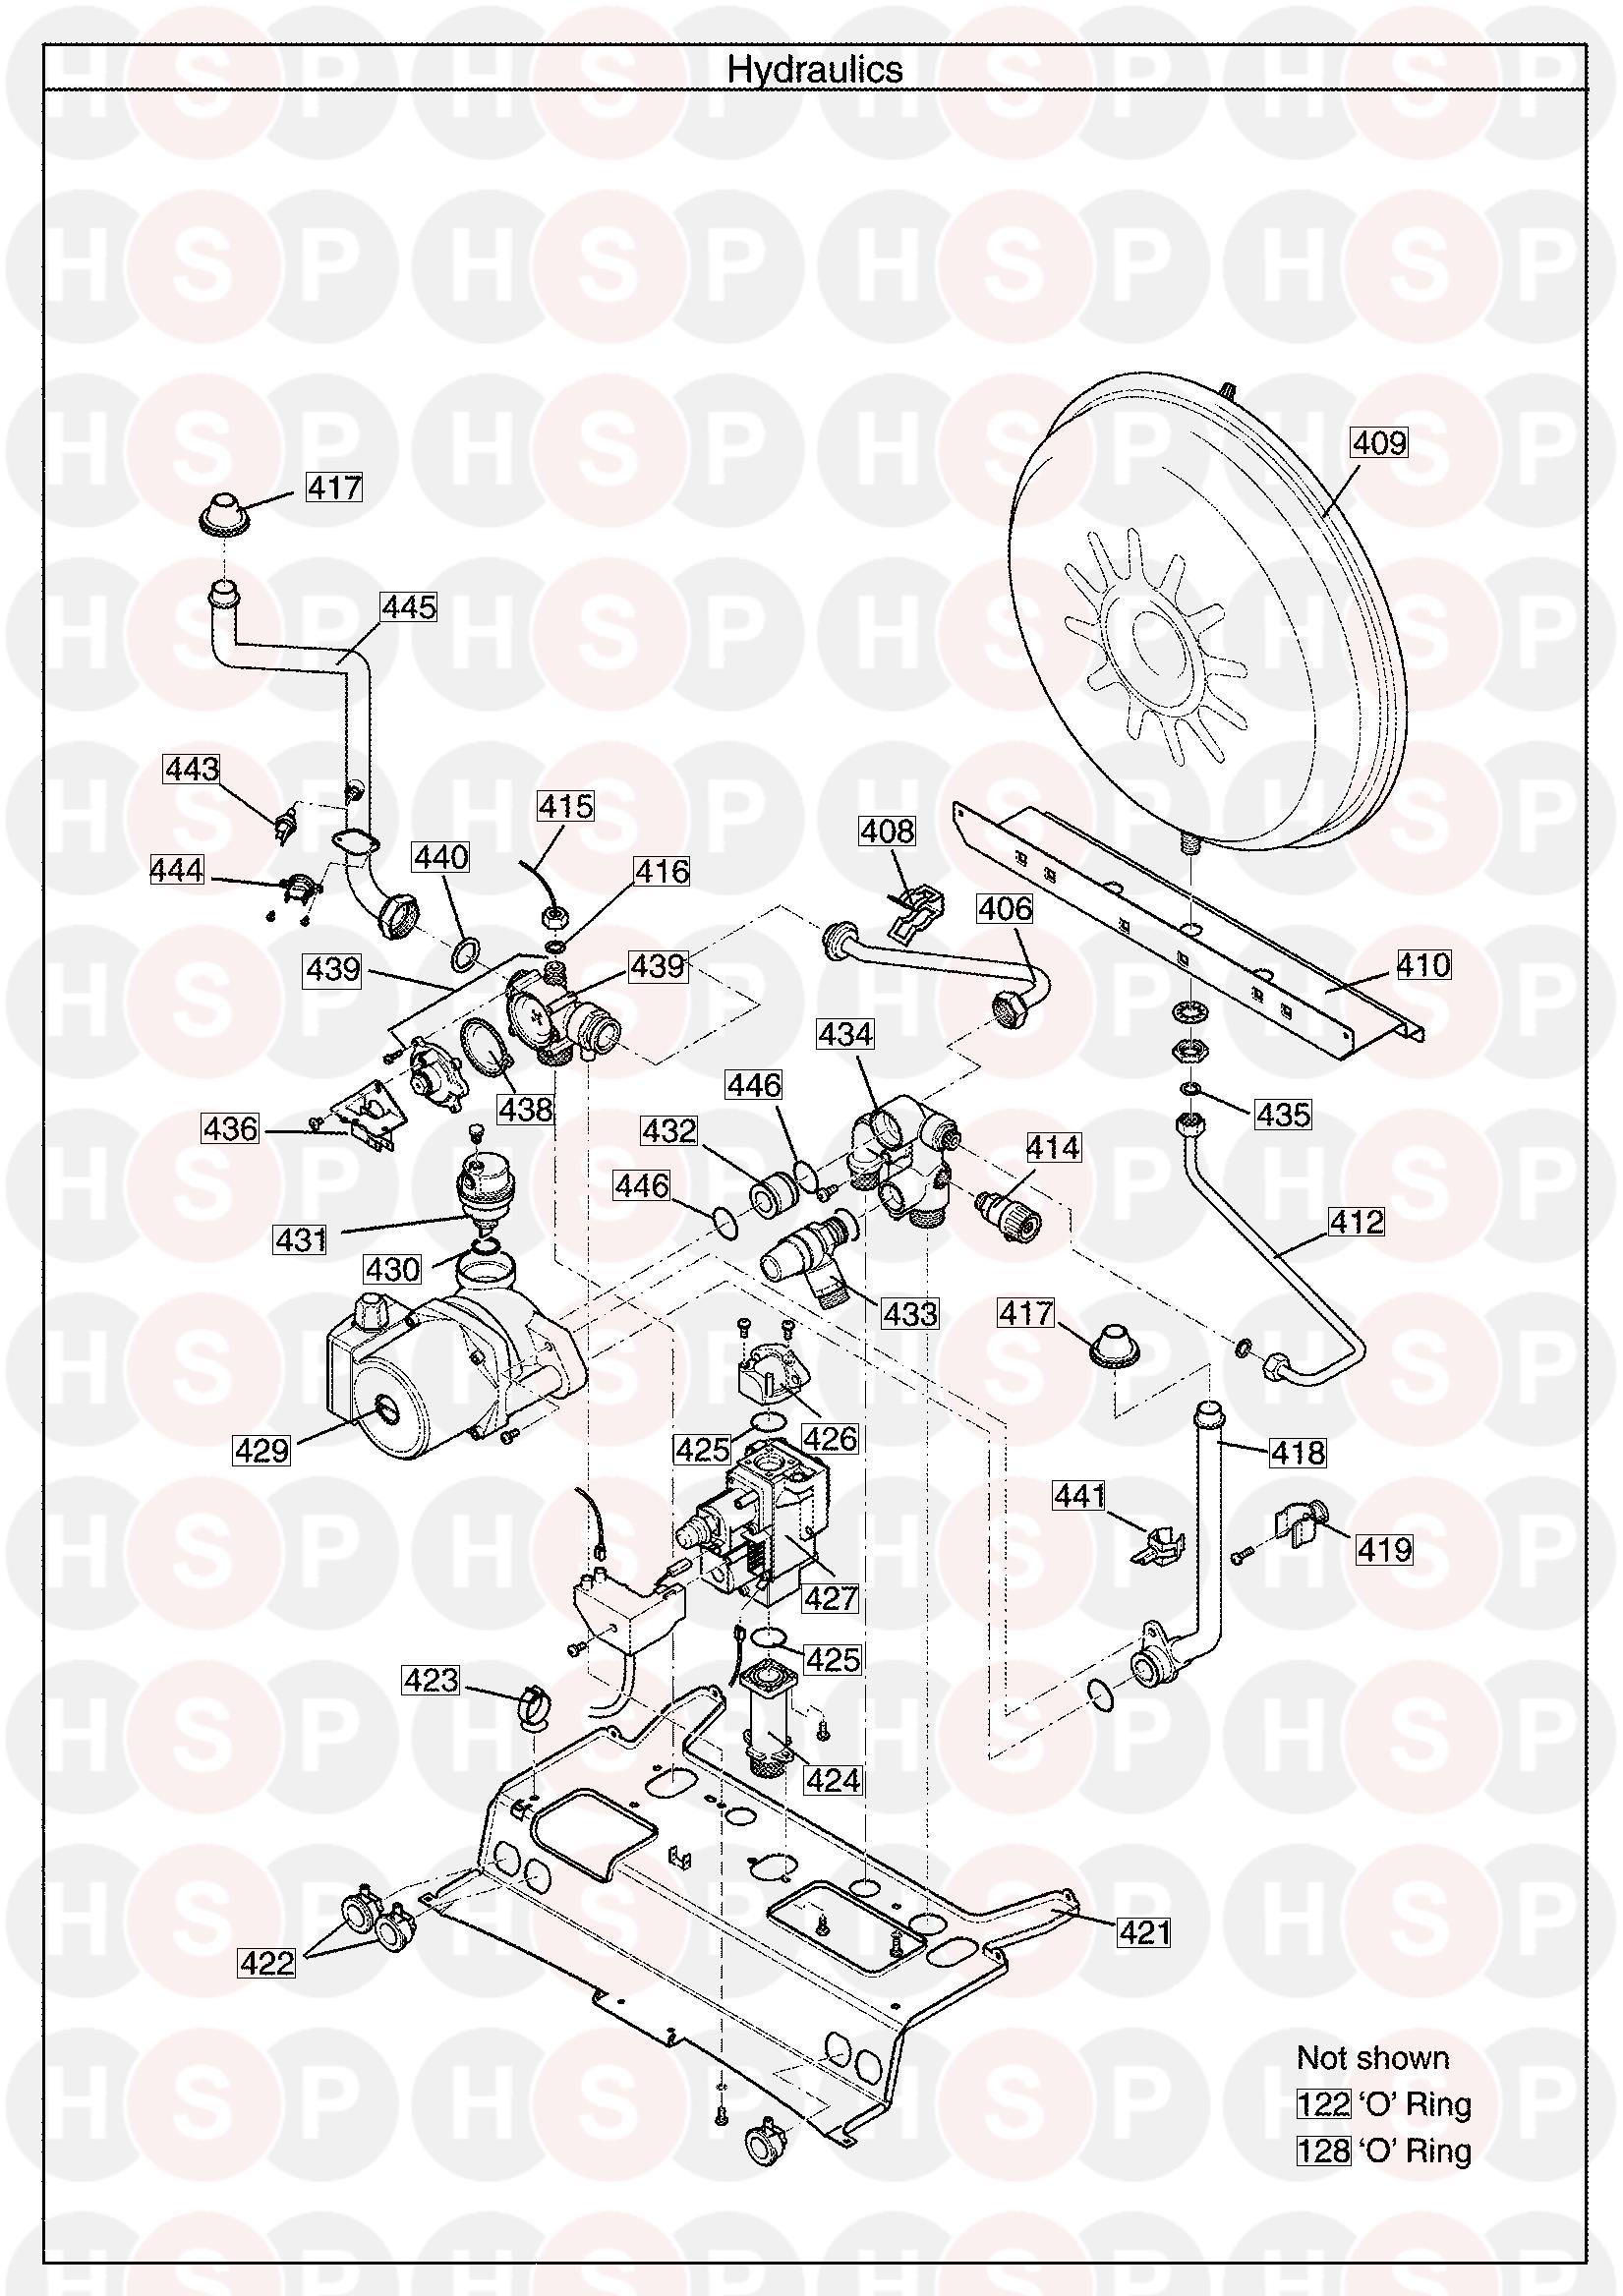 Potterton PERFORMA 18 HE SYSTEM (Hydraulics) Diagram